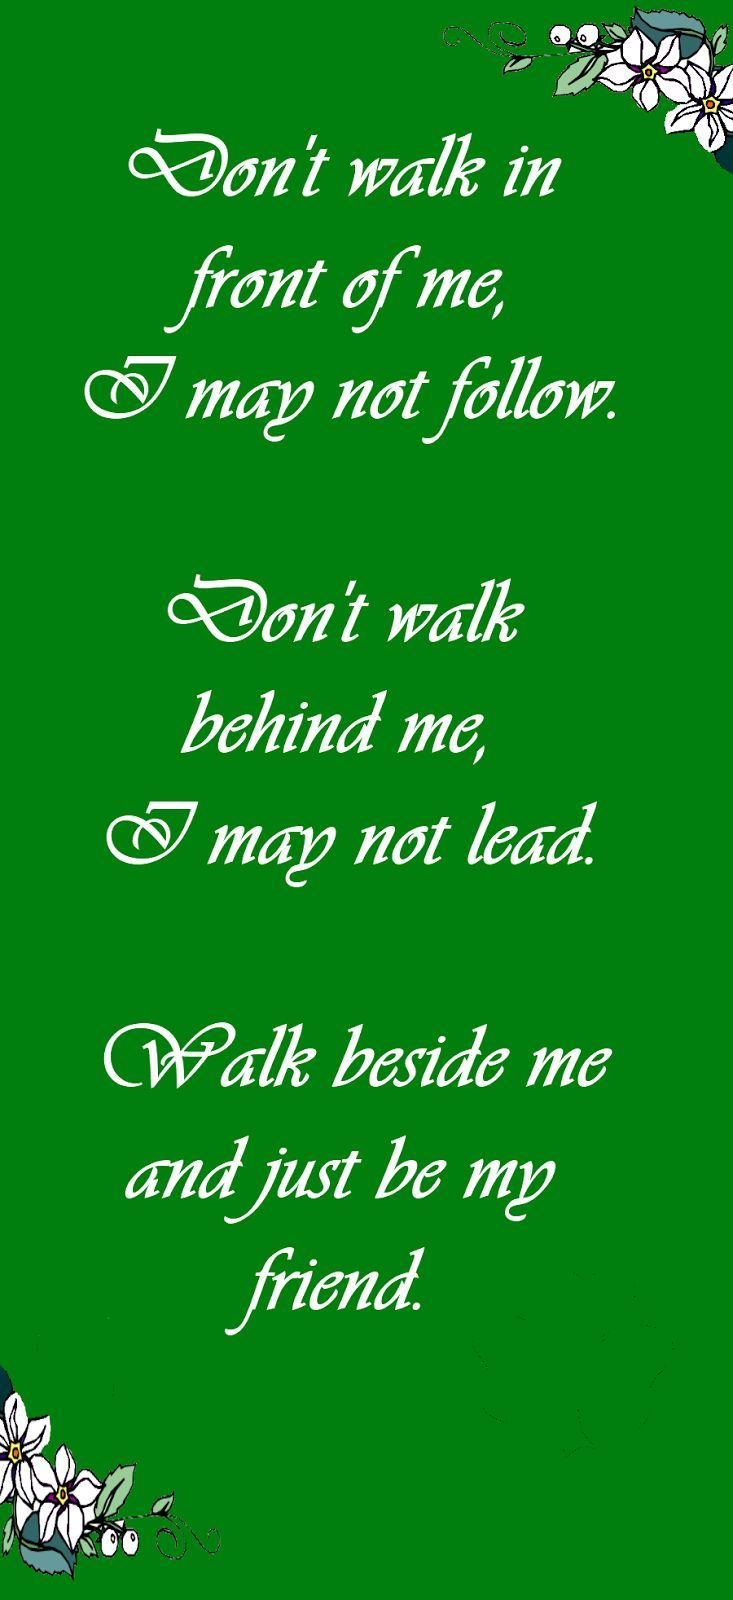 Merveilleux Irish Quotes